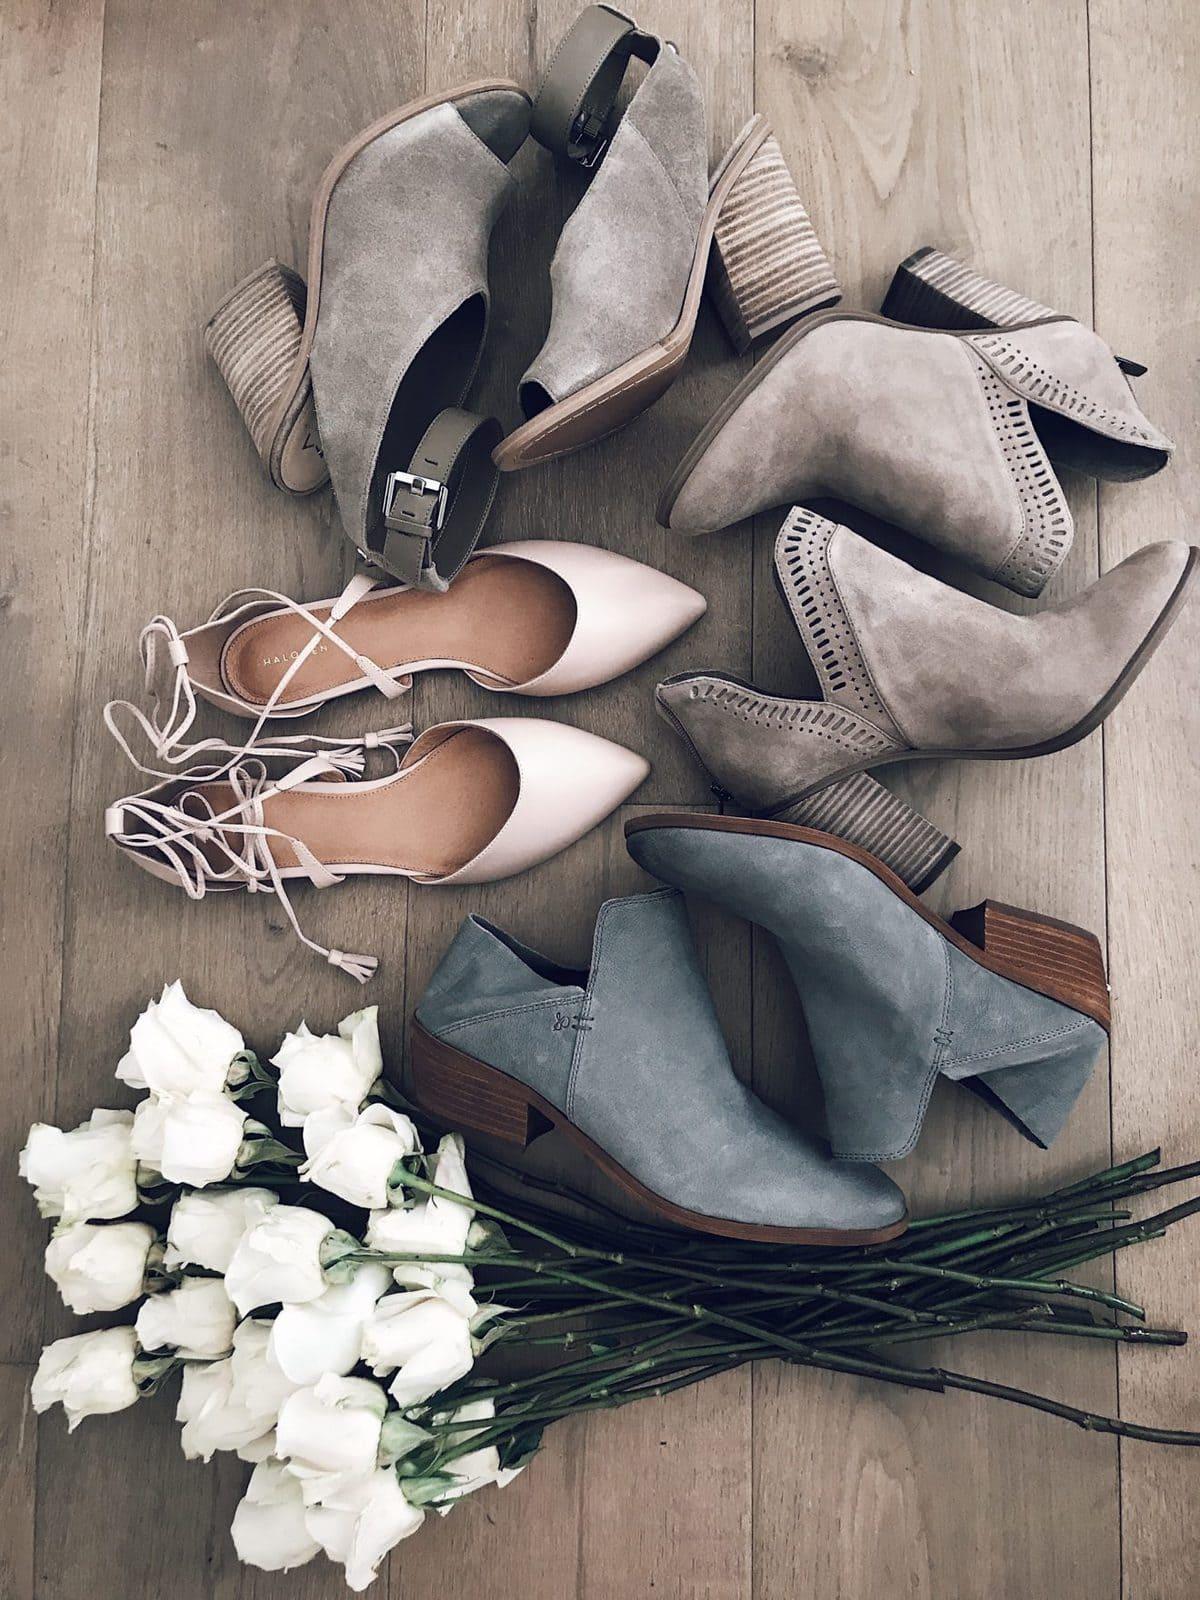 686336bd2f3 Nordstrom Anniversary Sale best women s shoes - Mint Arrow